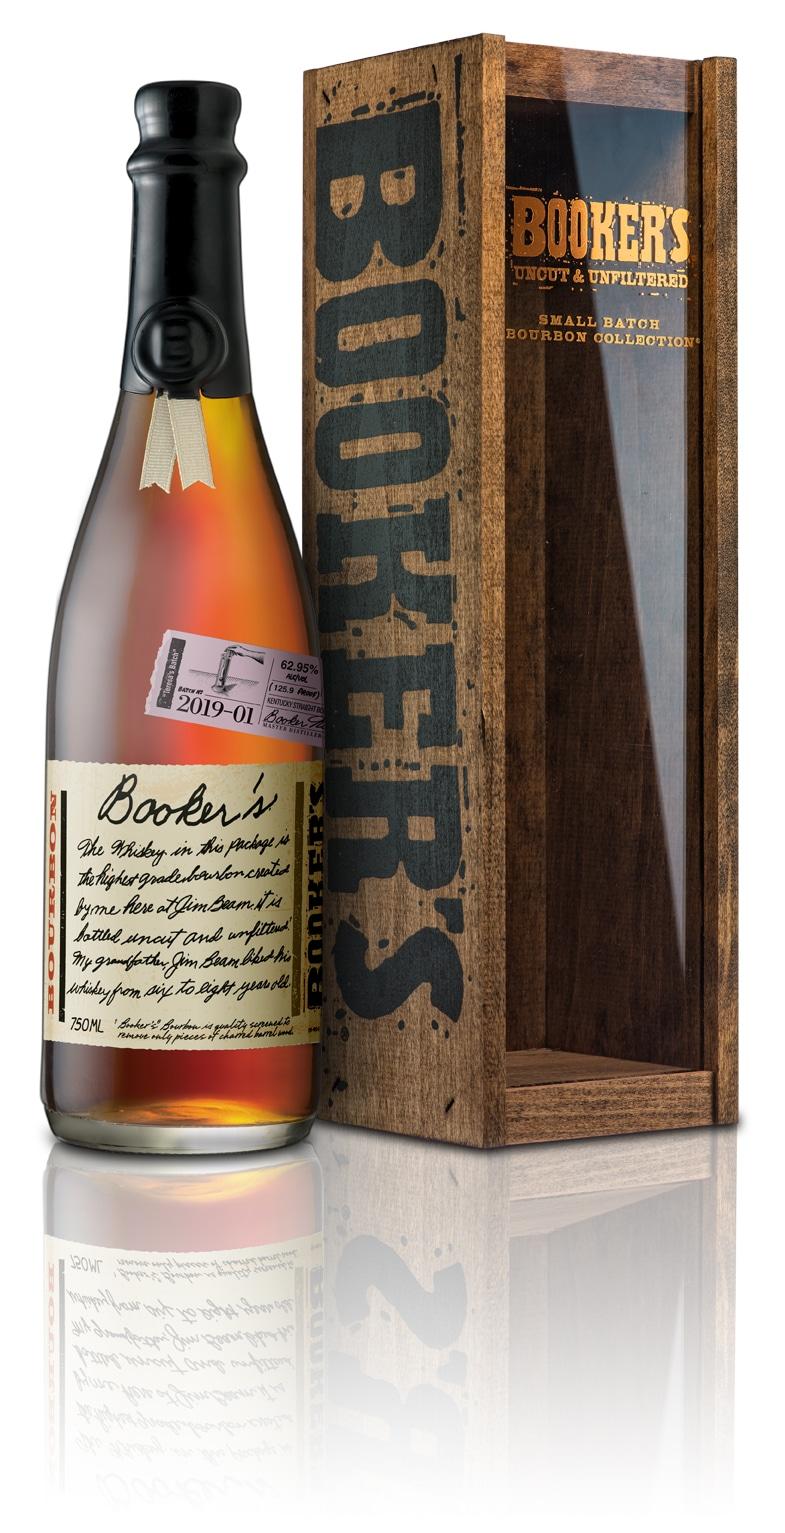 Booker/'s Uncut /& Unfiltered Small Batch Bourbon Wooden Storage Box